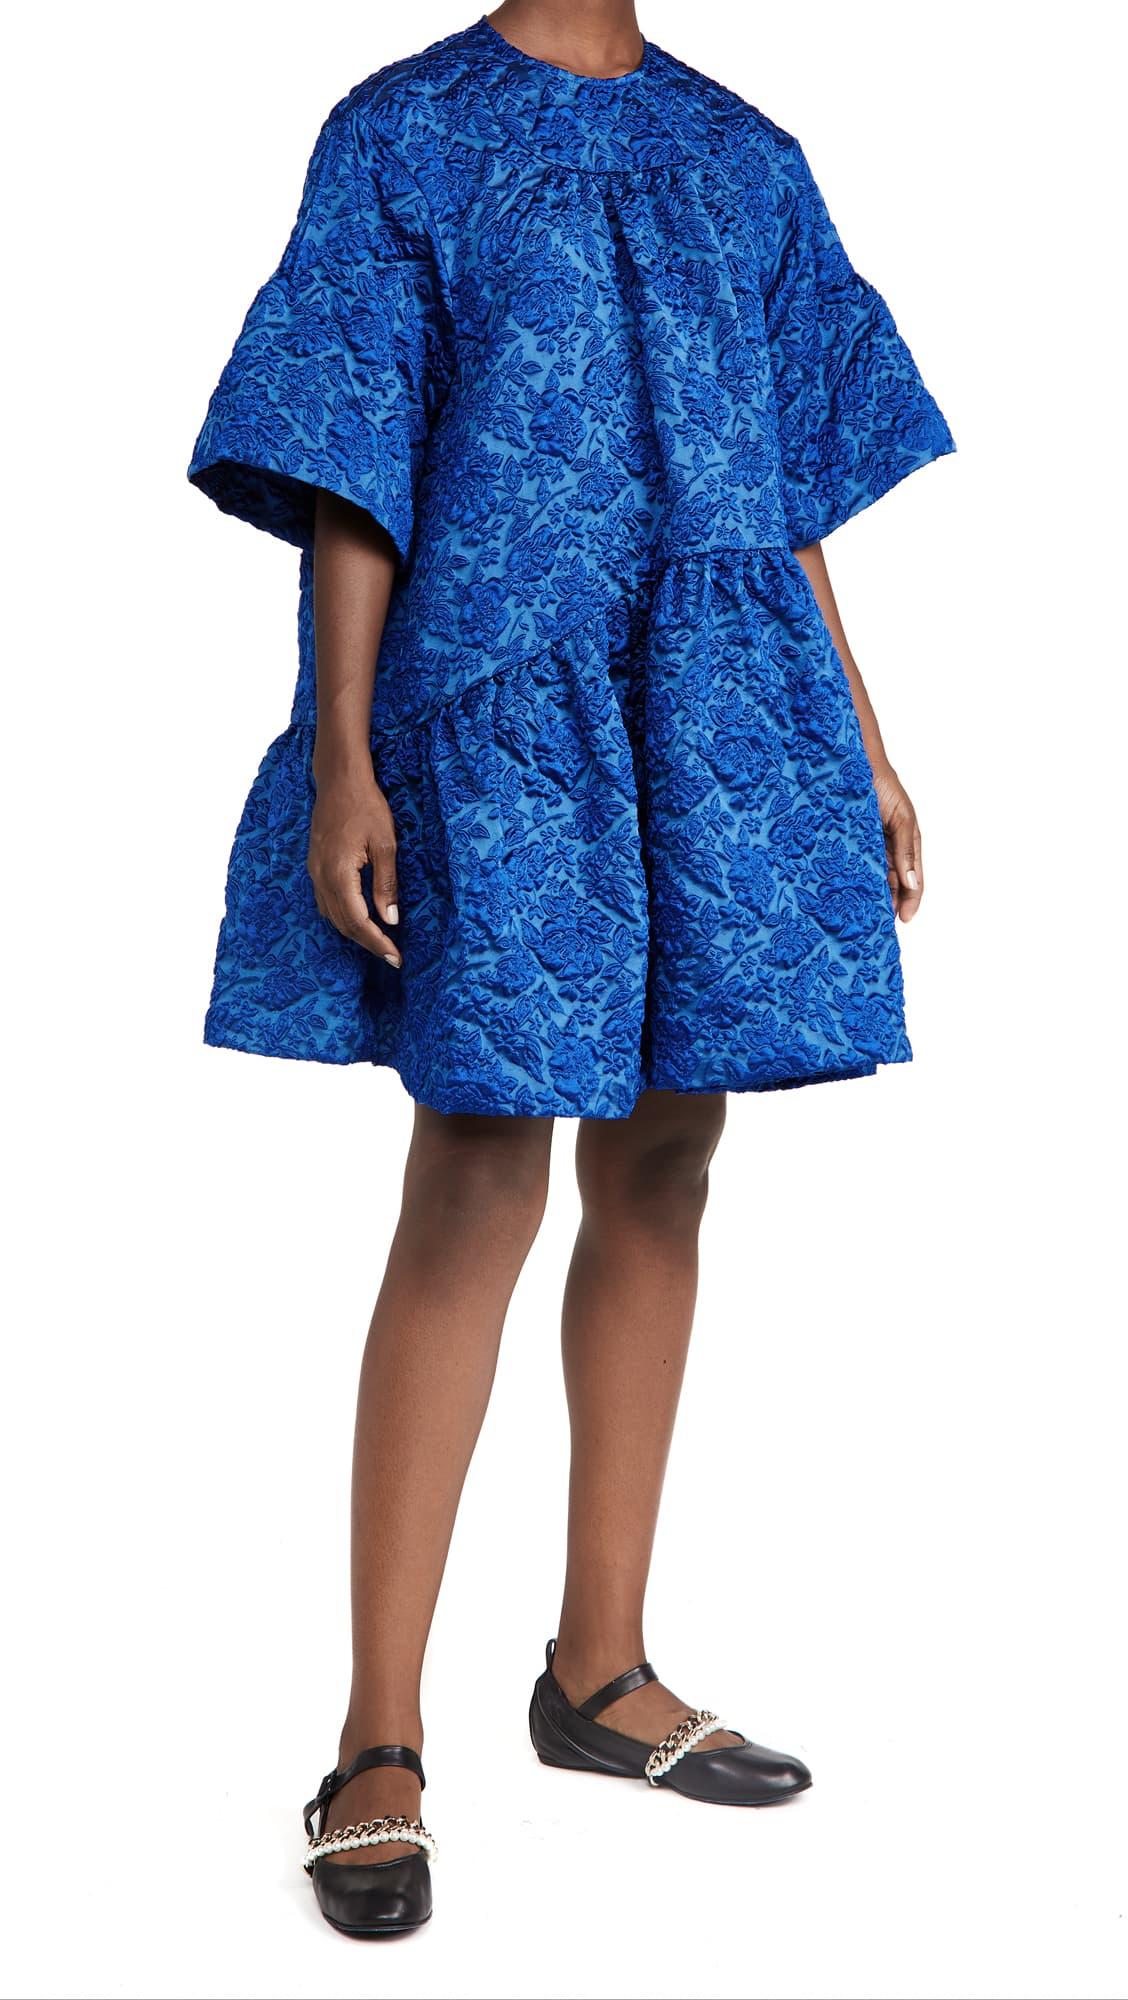 Simone Rocha Bright Blue Dress